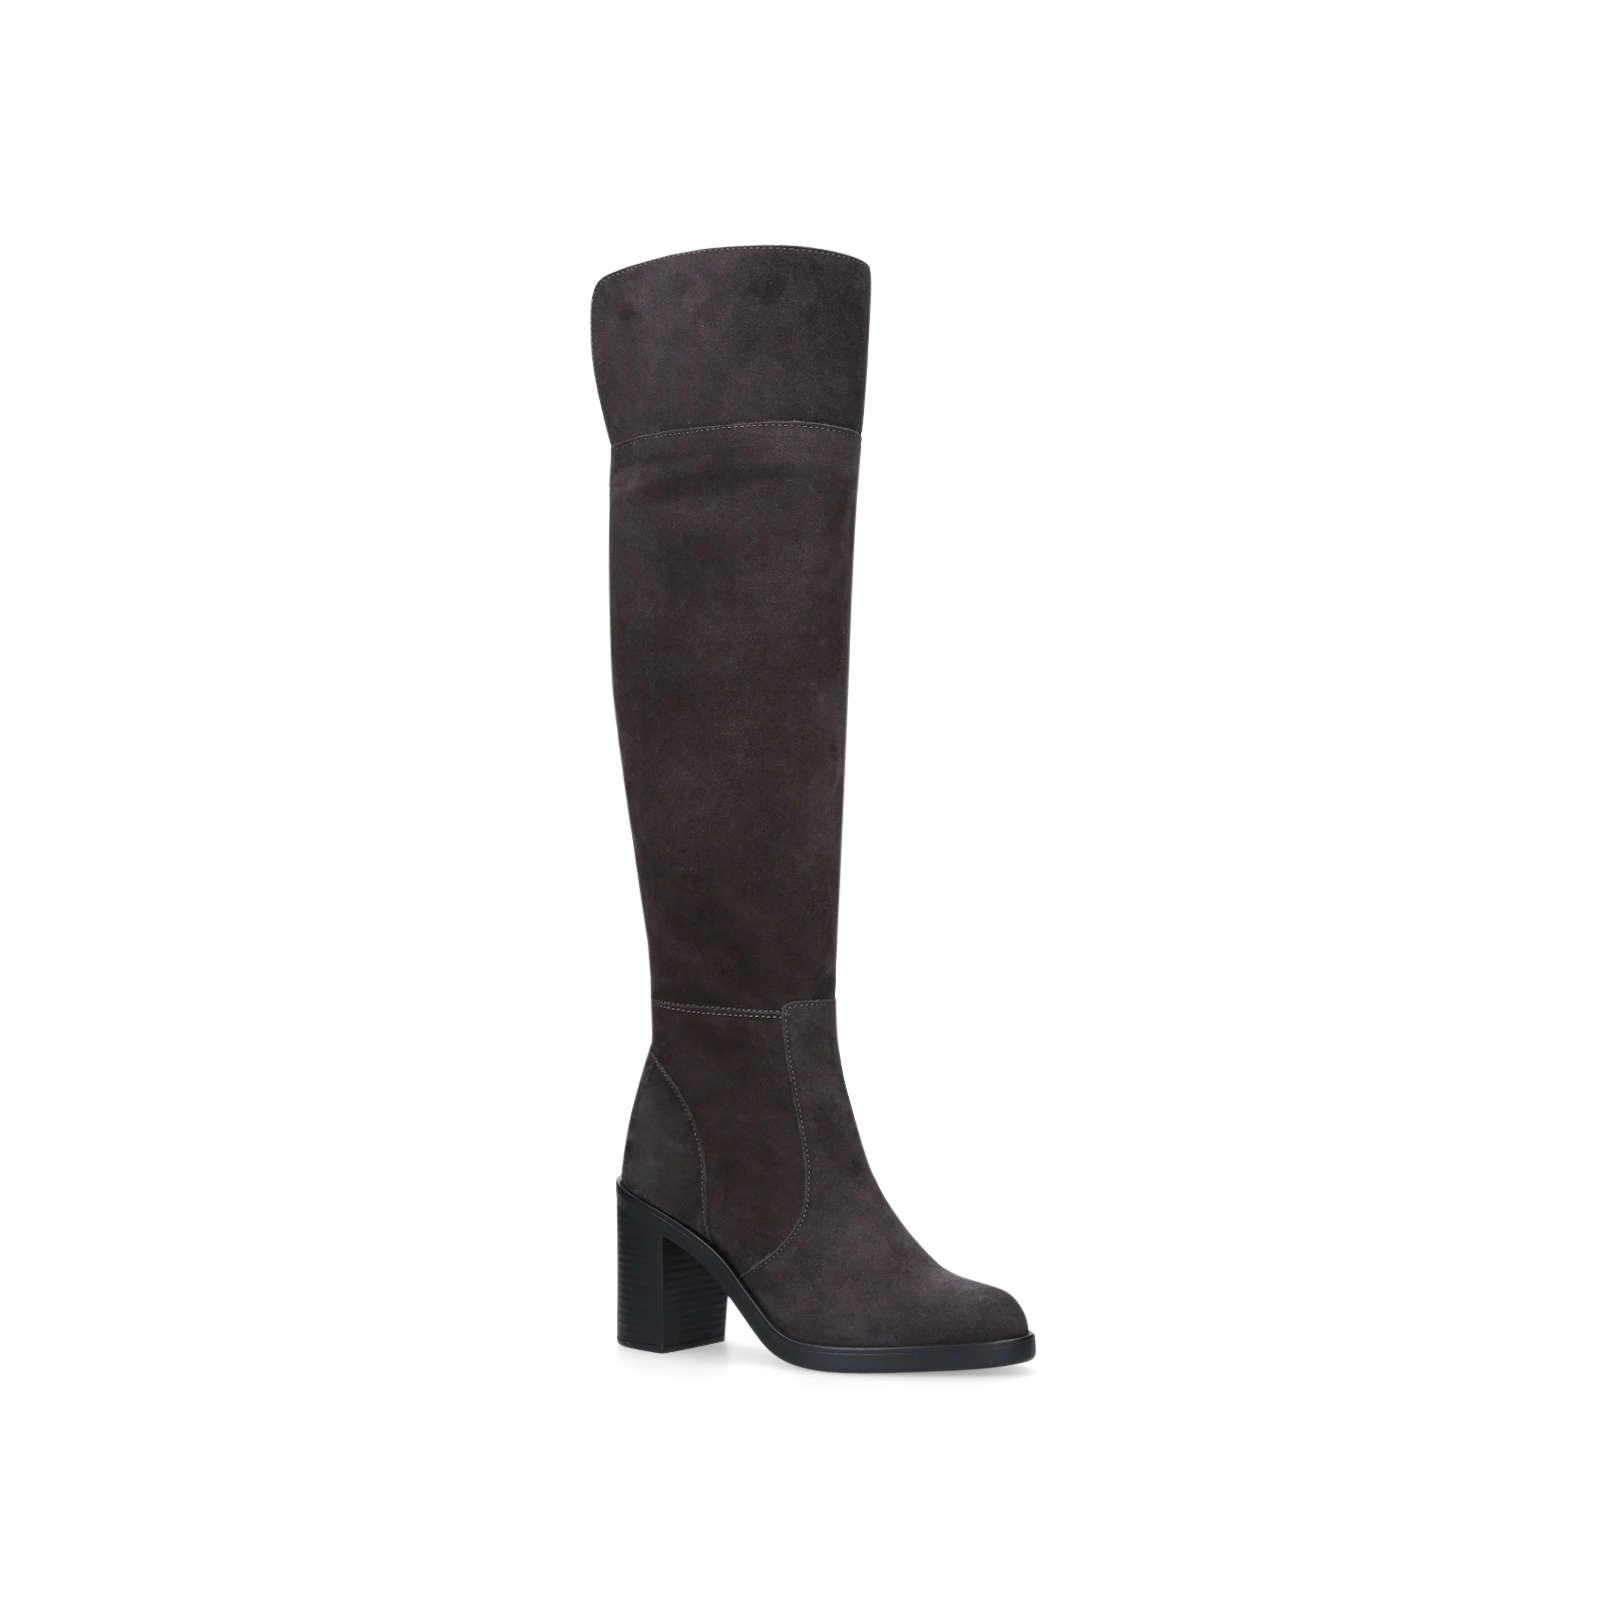 f141d00fa4e TRING Tring 85 Mm Heel High Leg Boots Kurt Geiger London Grey by ...